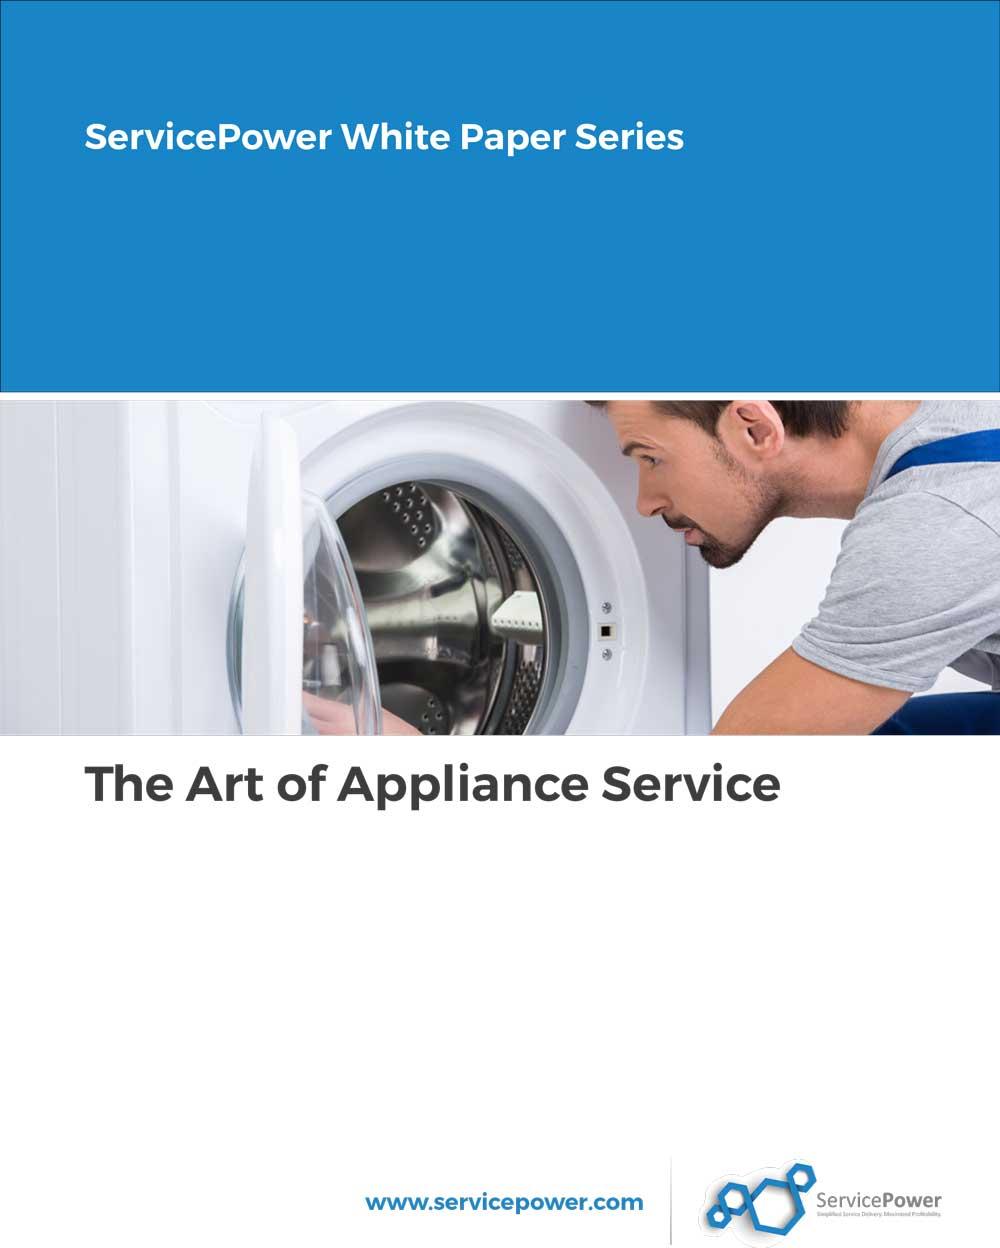 Major_Appliance2-1.jpg